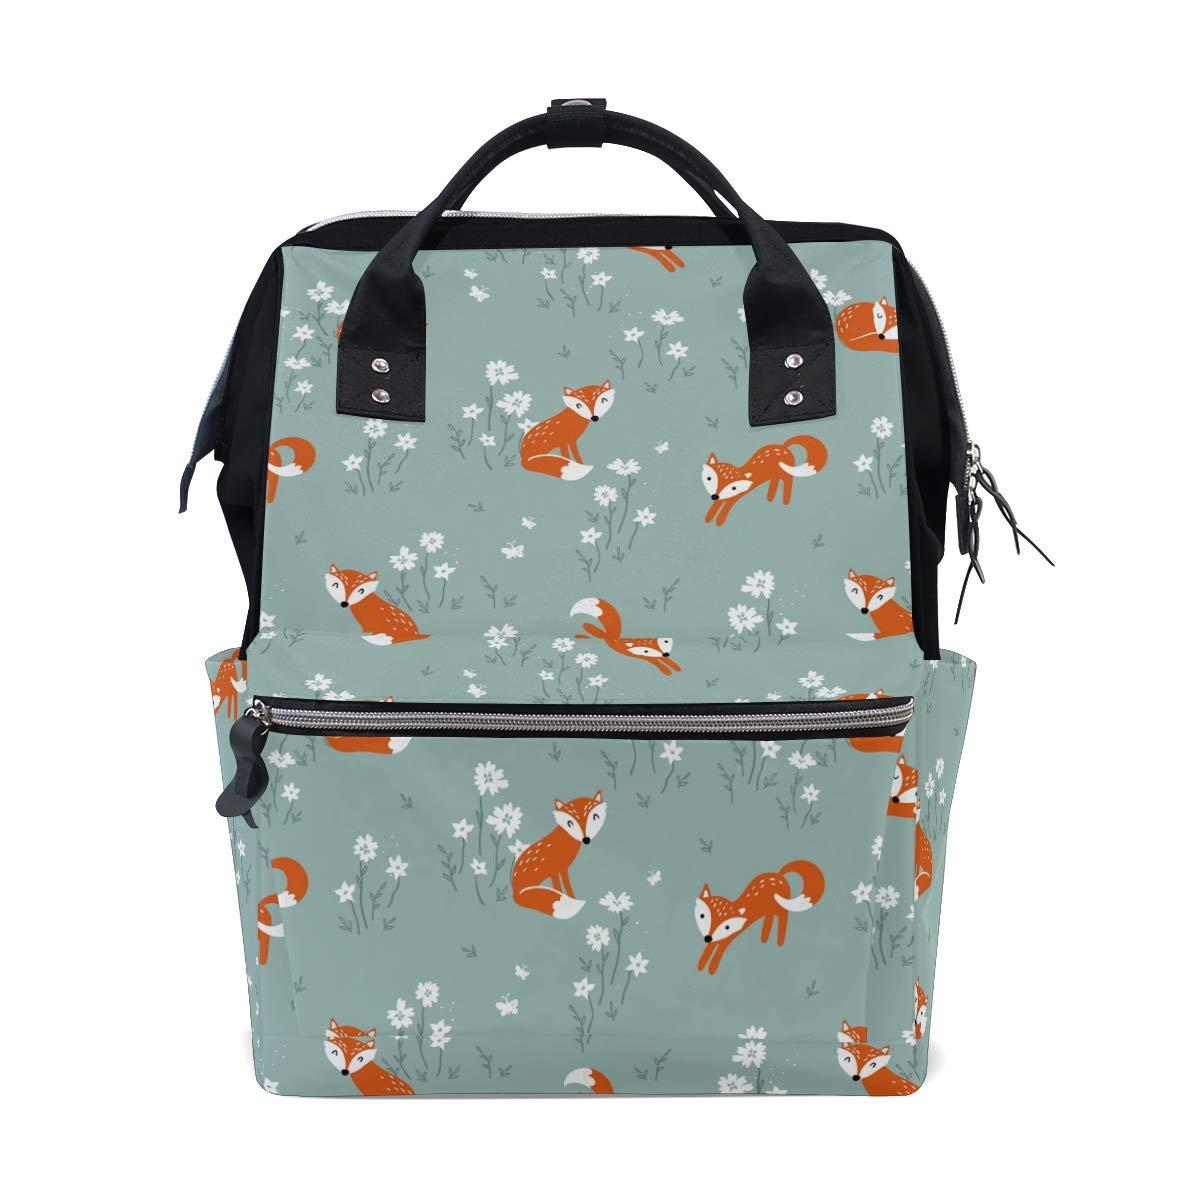 MERRYSUGAR Diaper Bag Baby Bag Backpack Fox Floral Flower Cartoon School Backpack Mommy Bag Large Multifunction Travel Bag